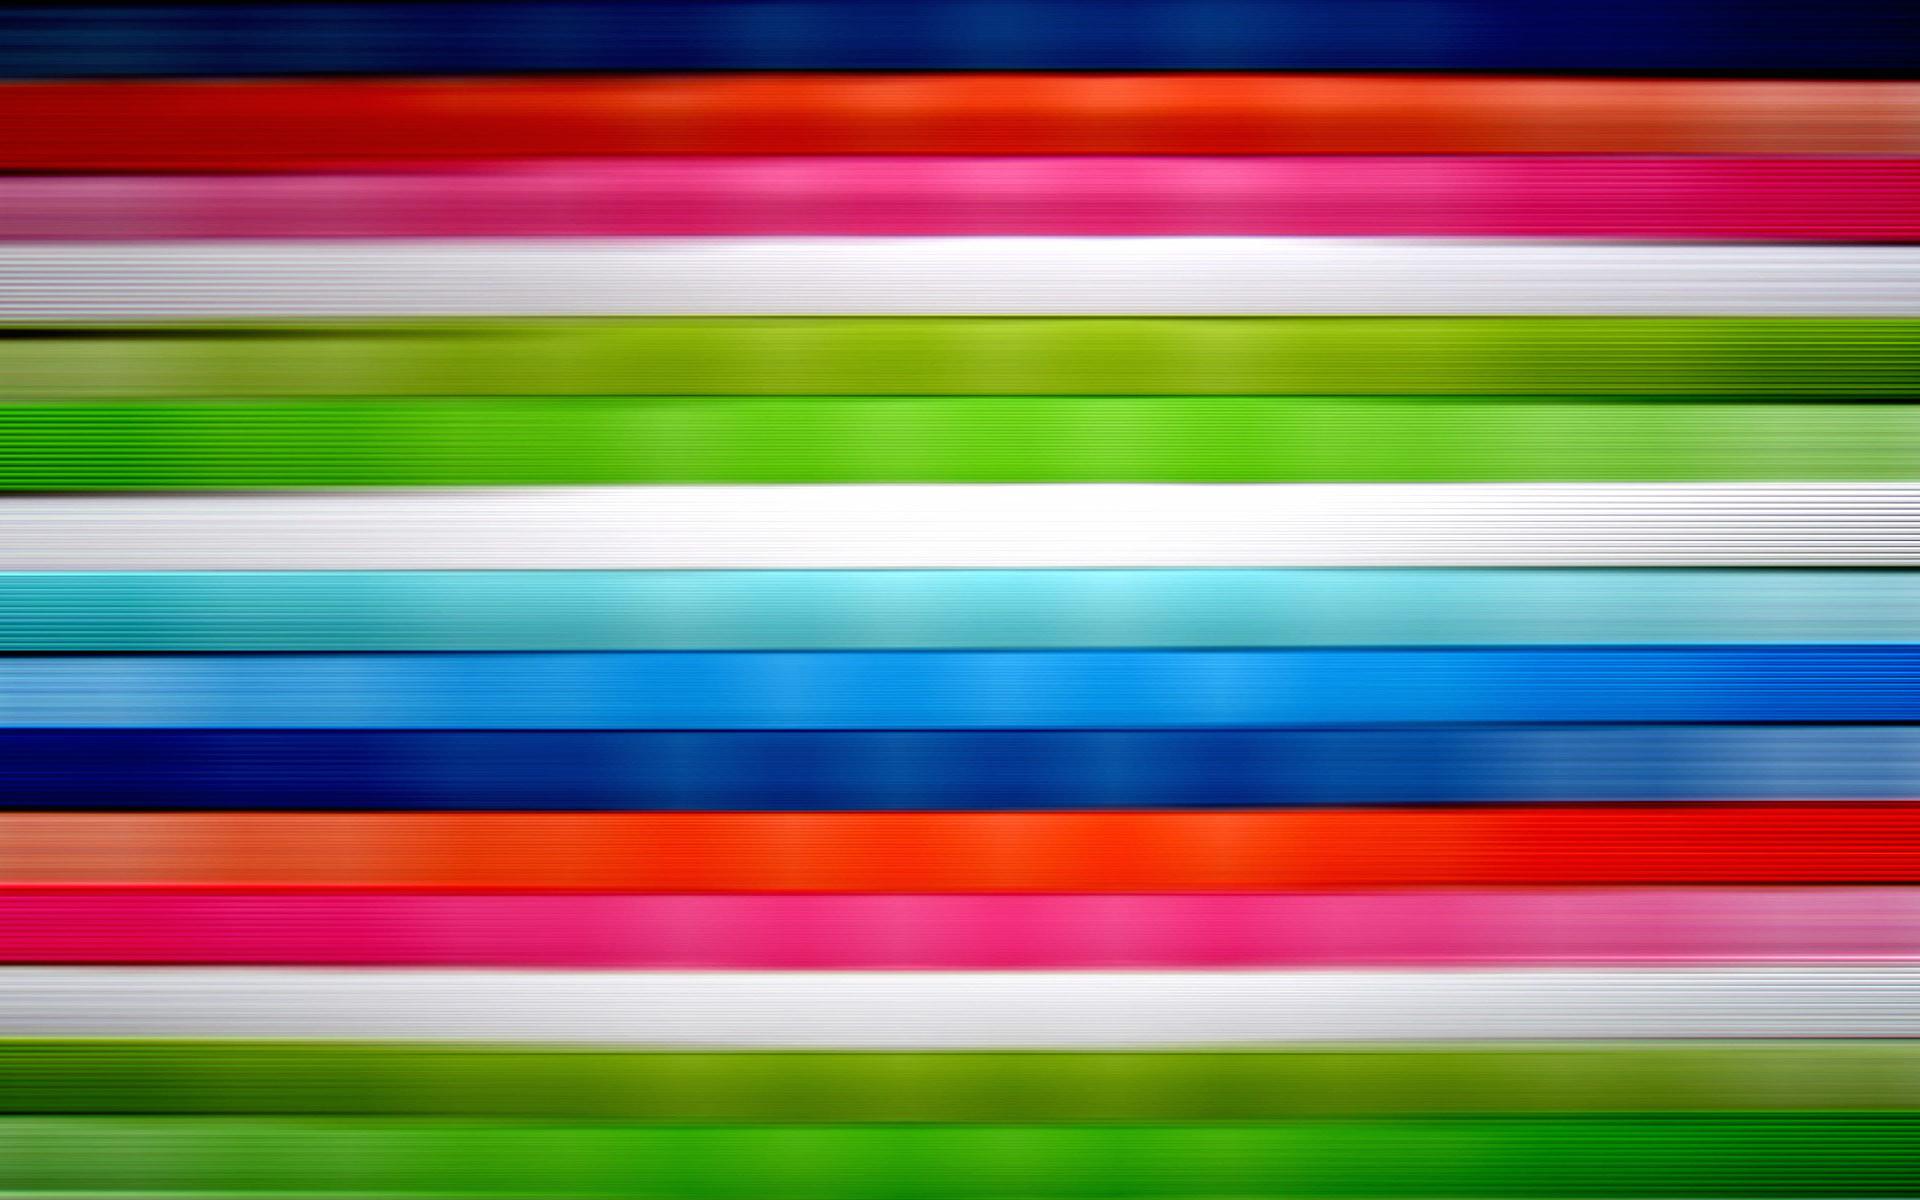 Res: 1920x1200, Tags: Colors Vivid